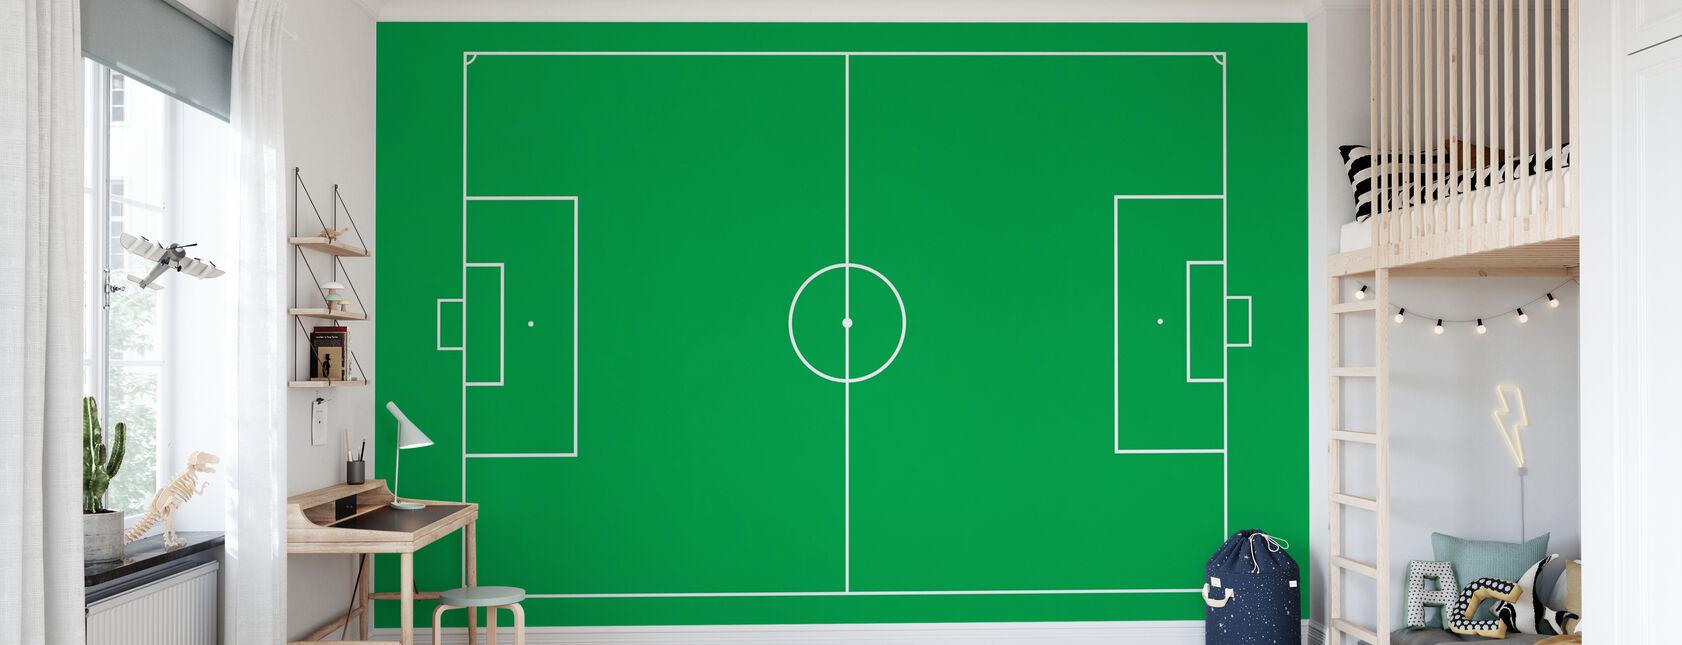 Soccer Field - Wallpaper - Kids Room